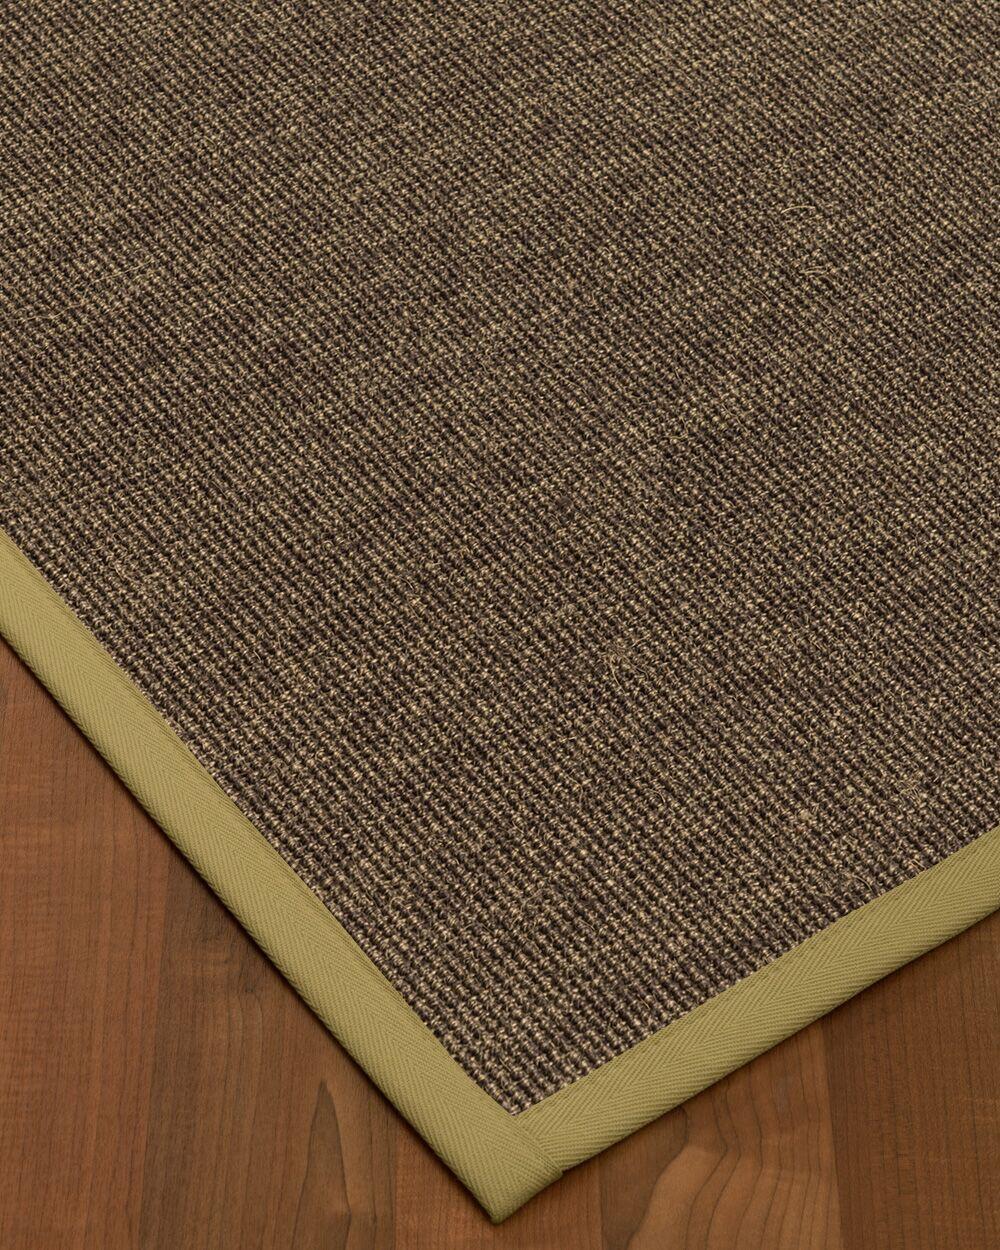 Bafford Hand-Woven Black Area Rug Rug Size: Rectangle 5' x 8'